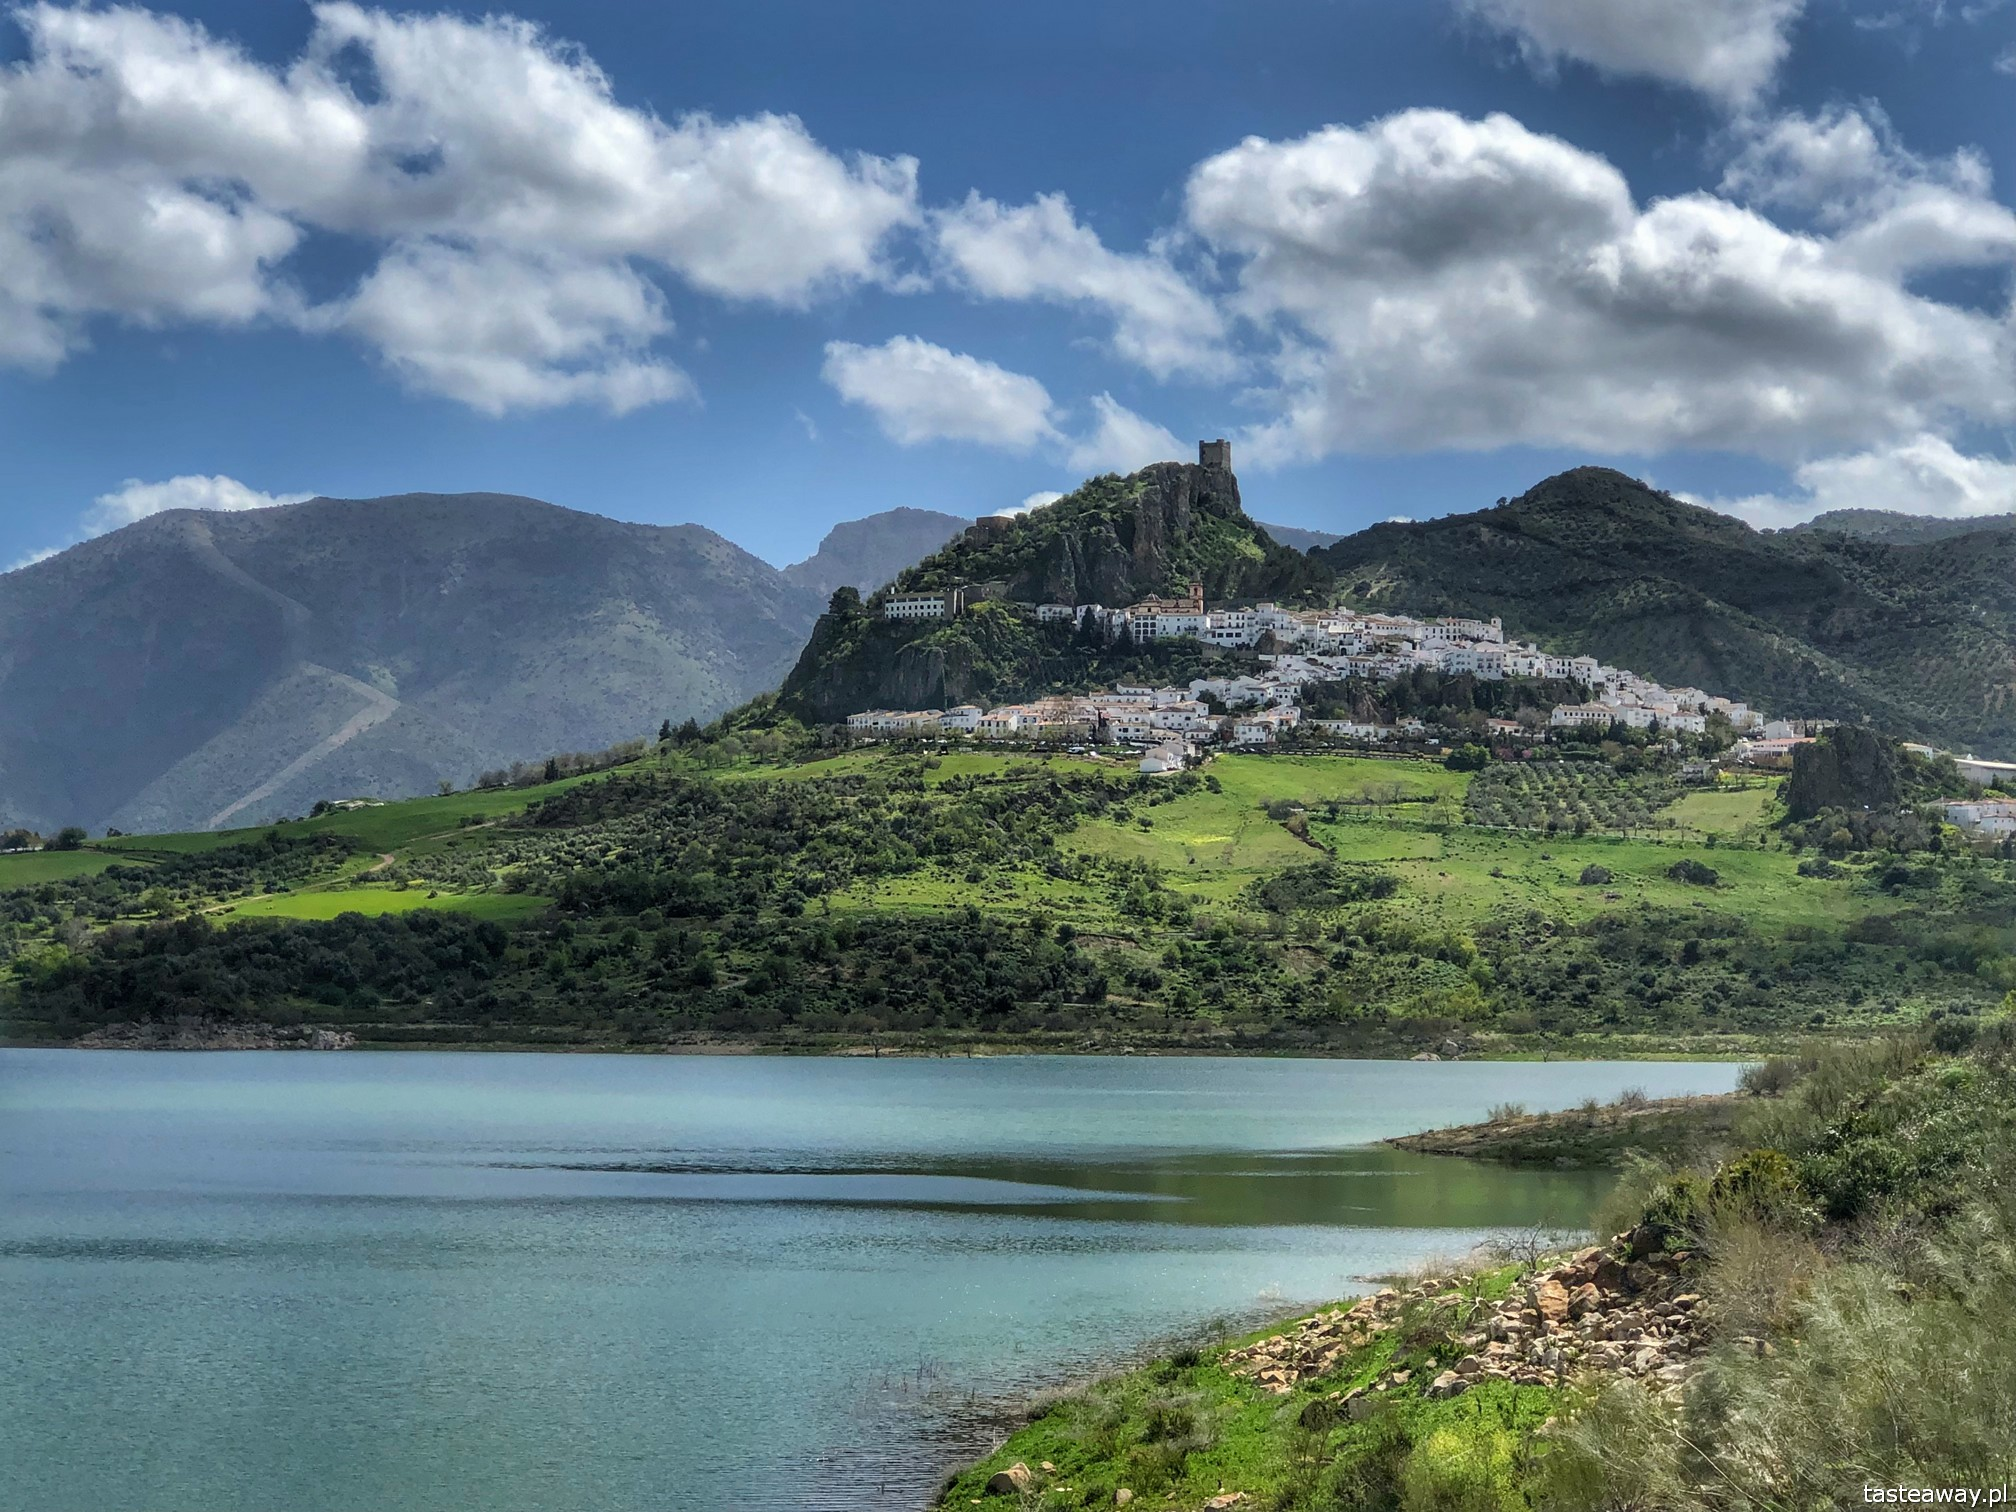 Andaluzja, najpiękniejsze miasteczka Andaluzji, pueblos blancos, co zobaczyć w Andaluzji, ruta de los pueblos blancos, Zahara de la Sierra